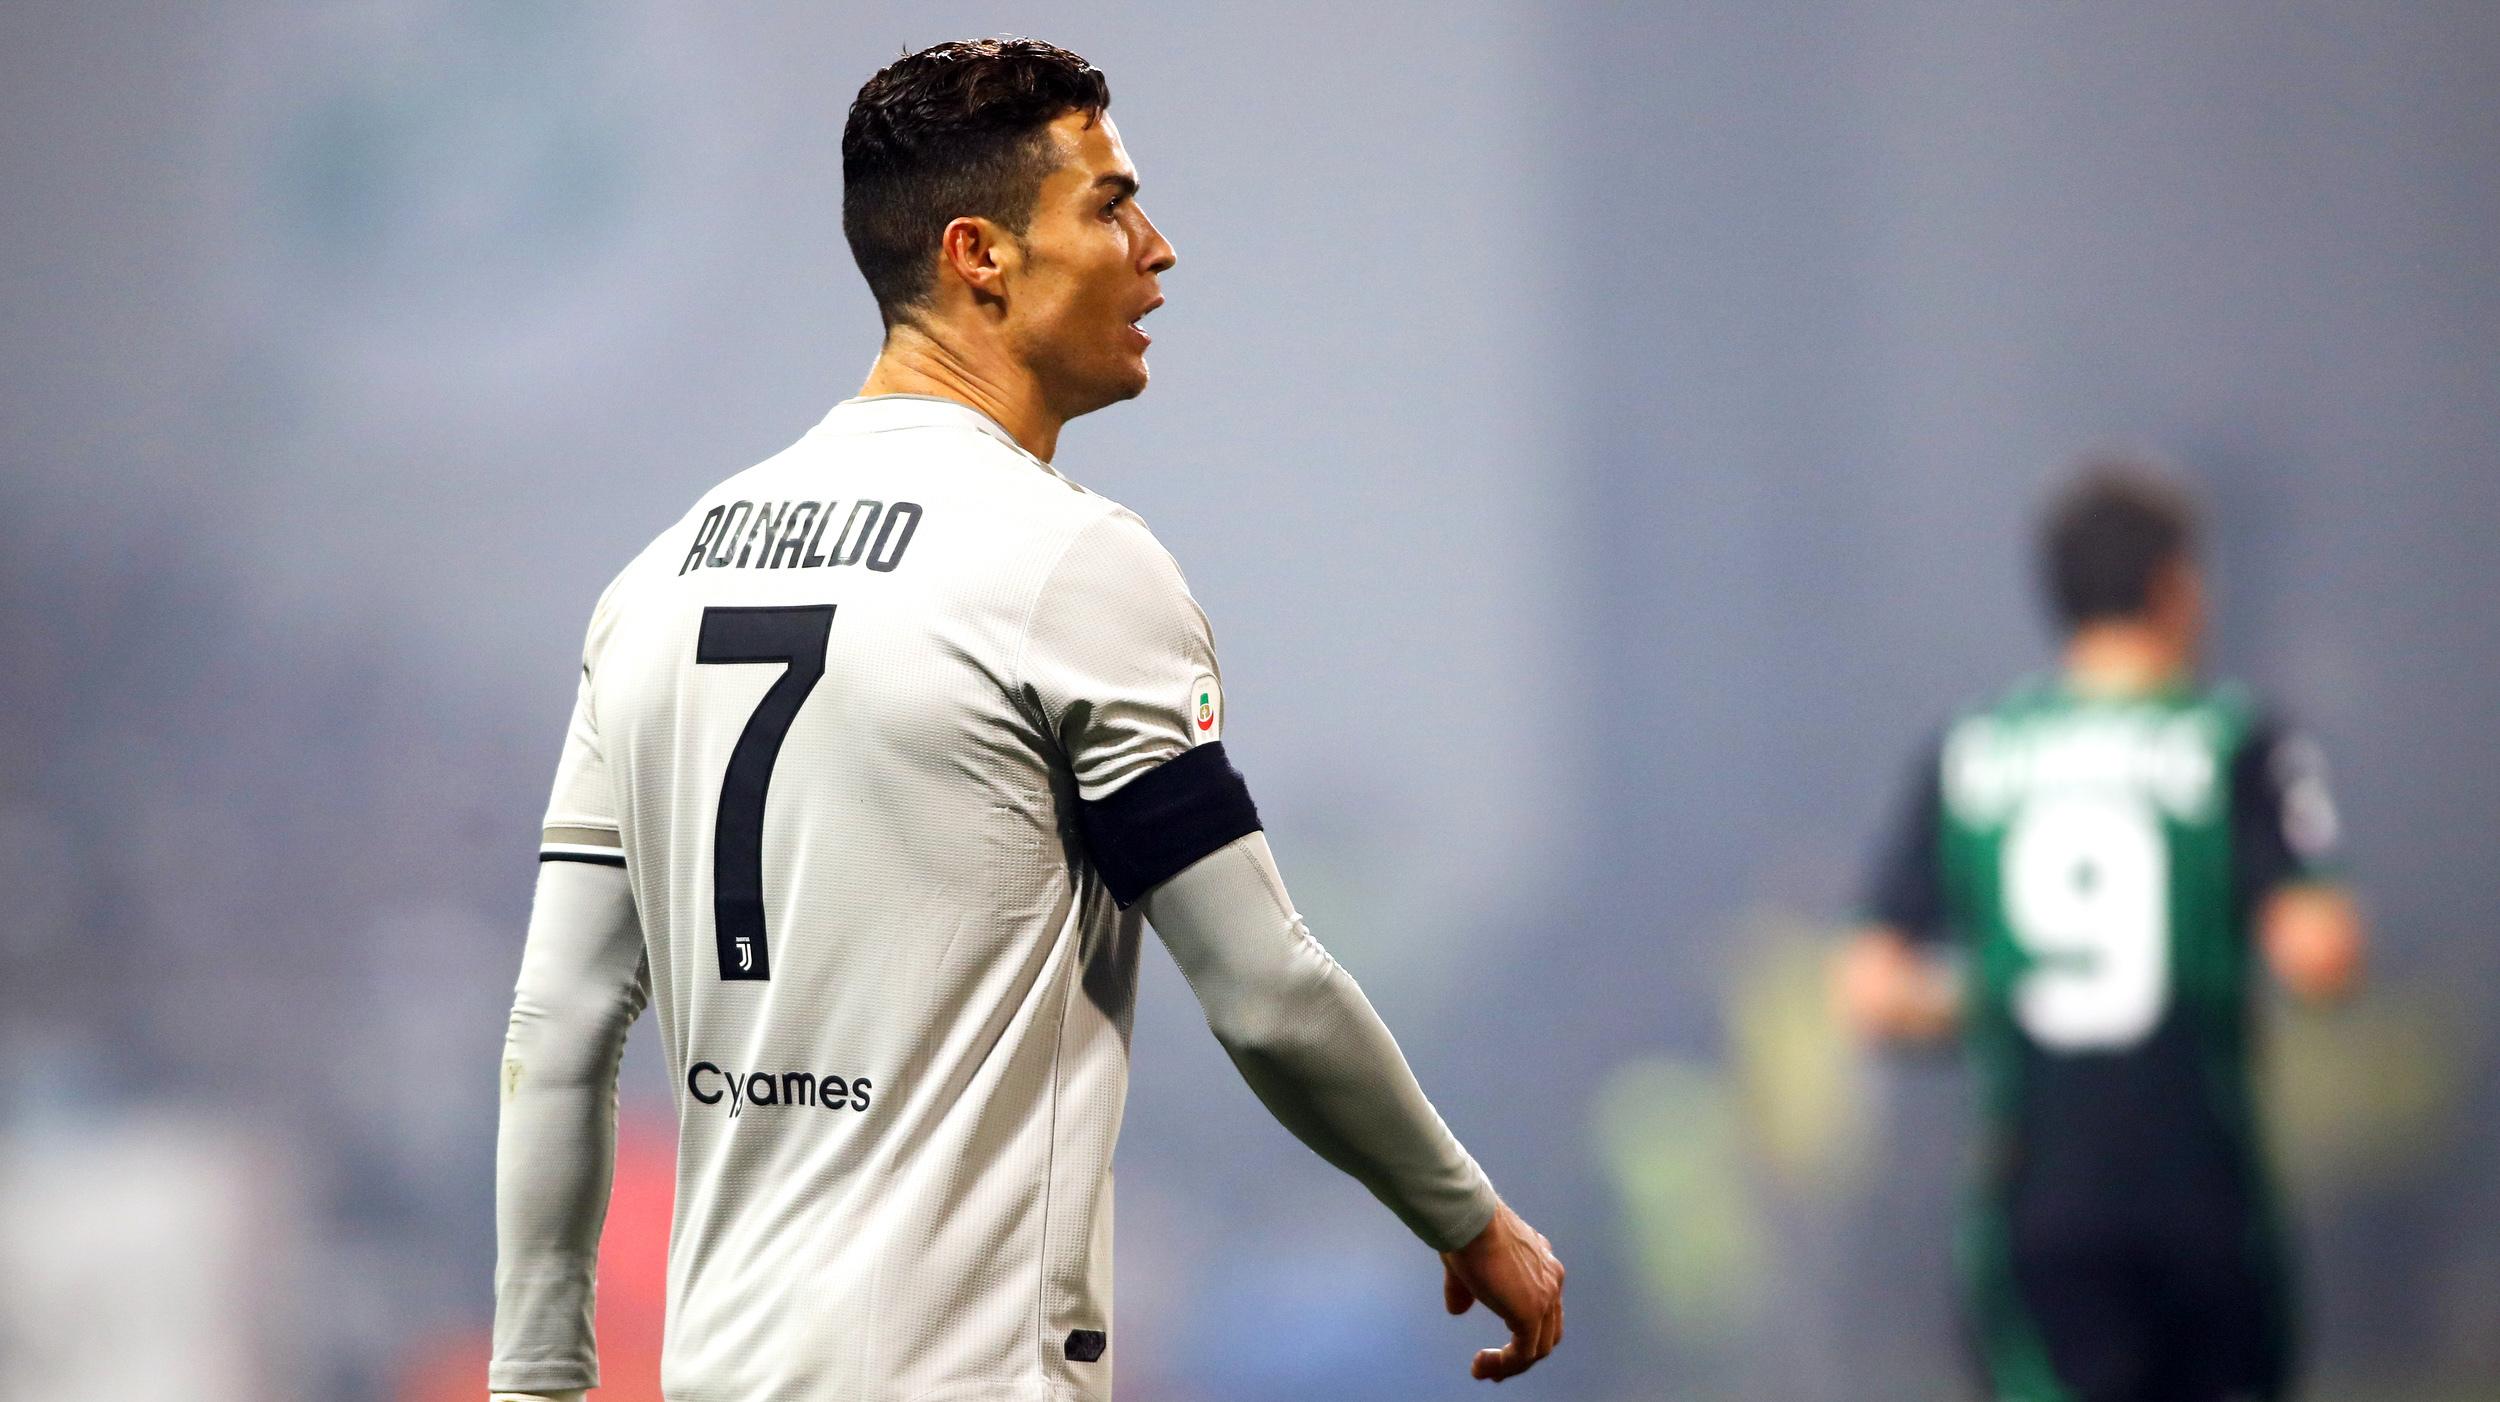 Juve - Cristiano Ronaldo